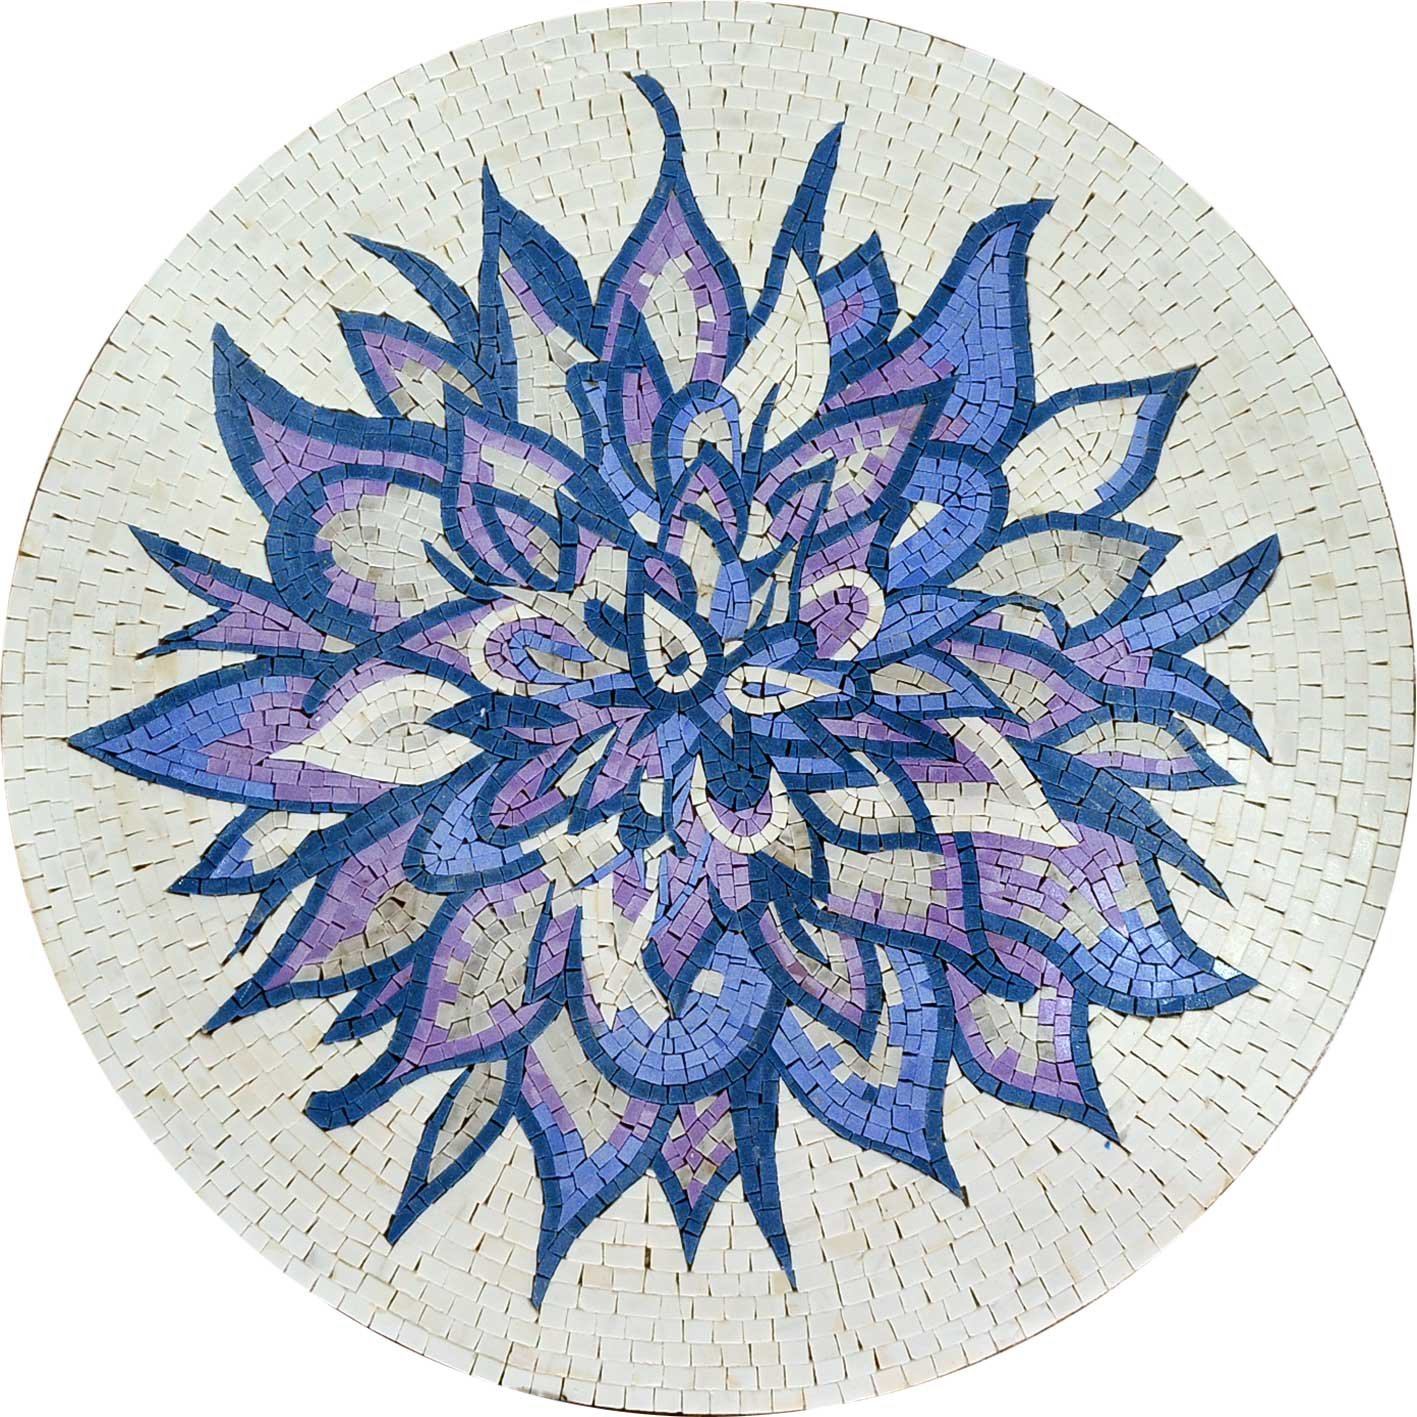 Hand Made Flowery Medallion Mosaic Pattern Stone Art Floor Wall Decor (70